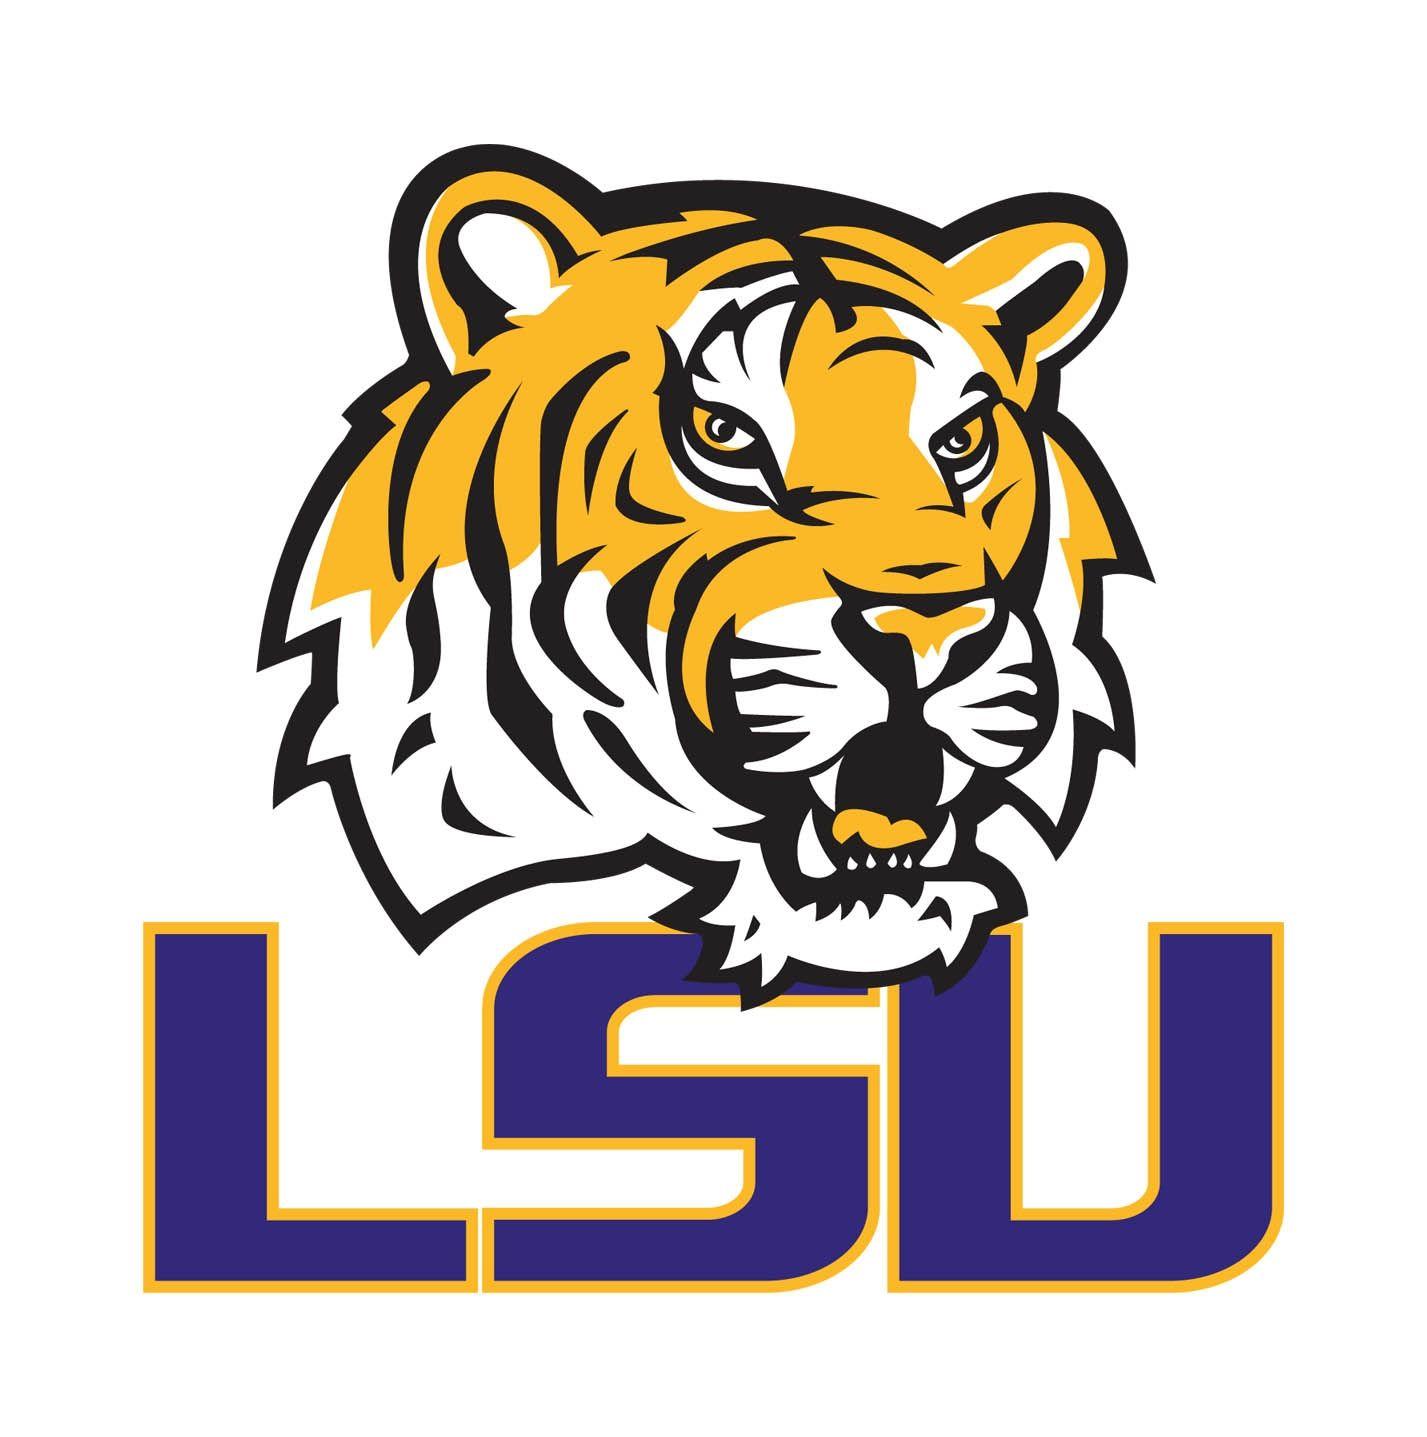 Trường Đại Học Louisiana State University – Baton Rouge, Louisiana, Mỹ